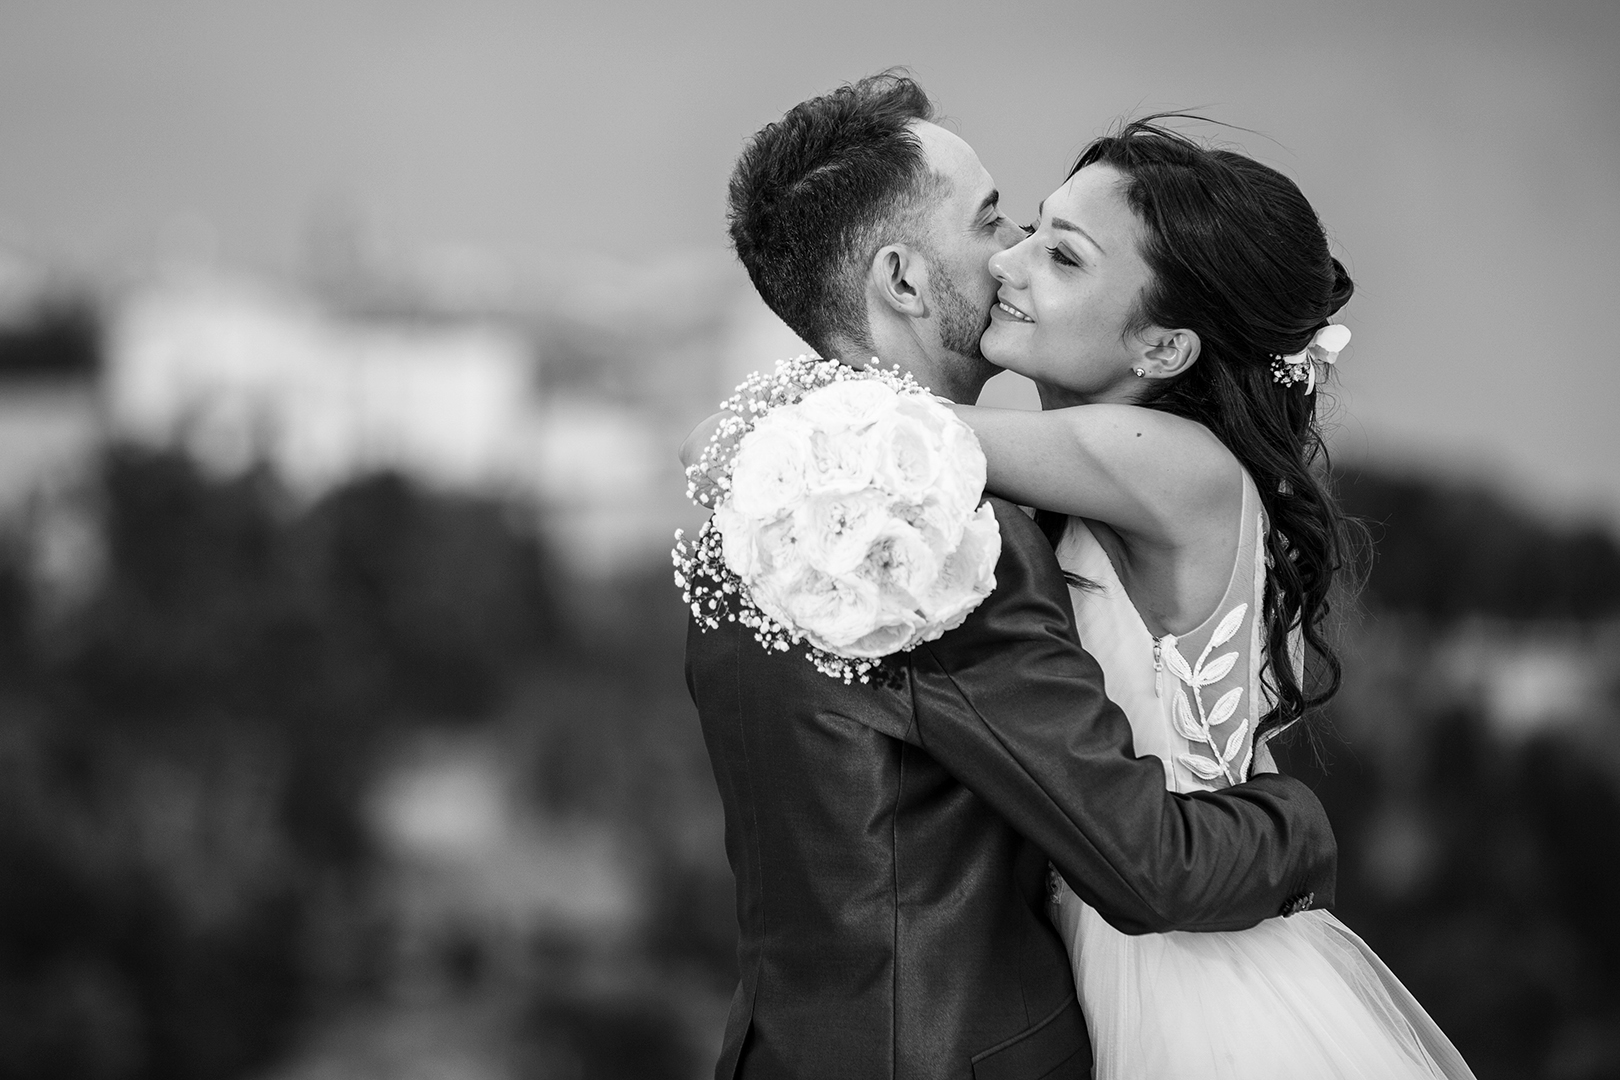 gianni-lepore-matrimonio-bianco-nero-gargano